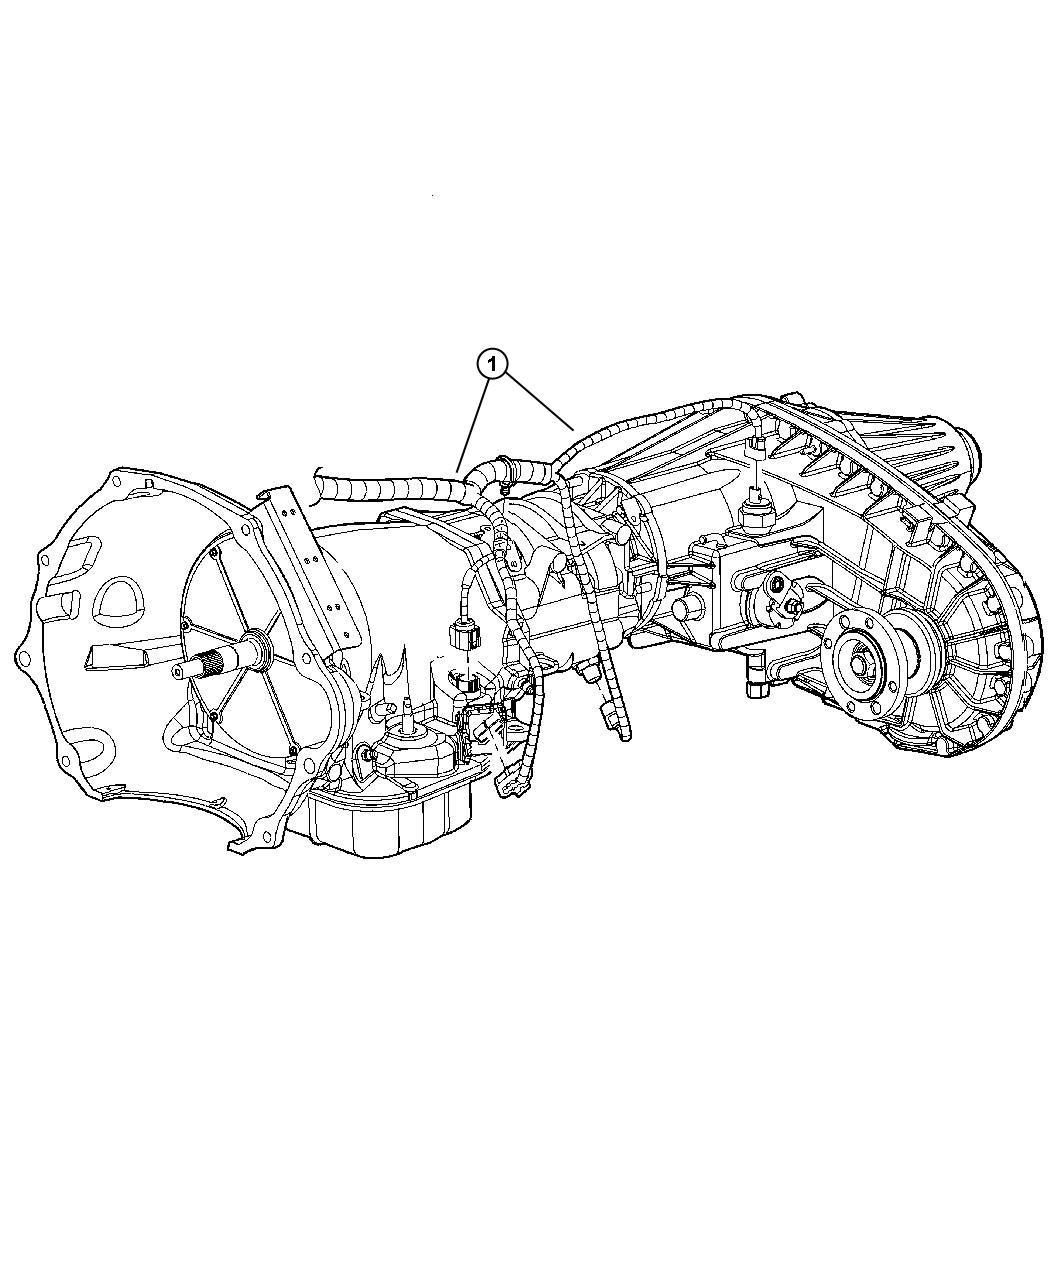 Dodge Ram Wiring Harness